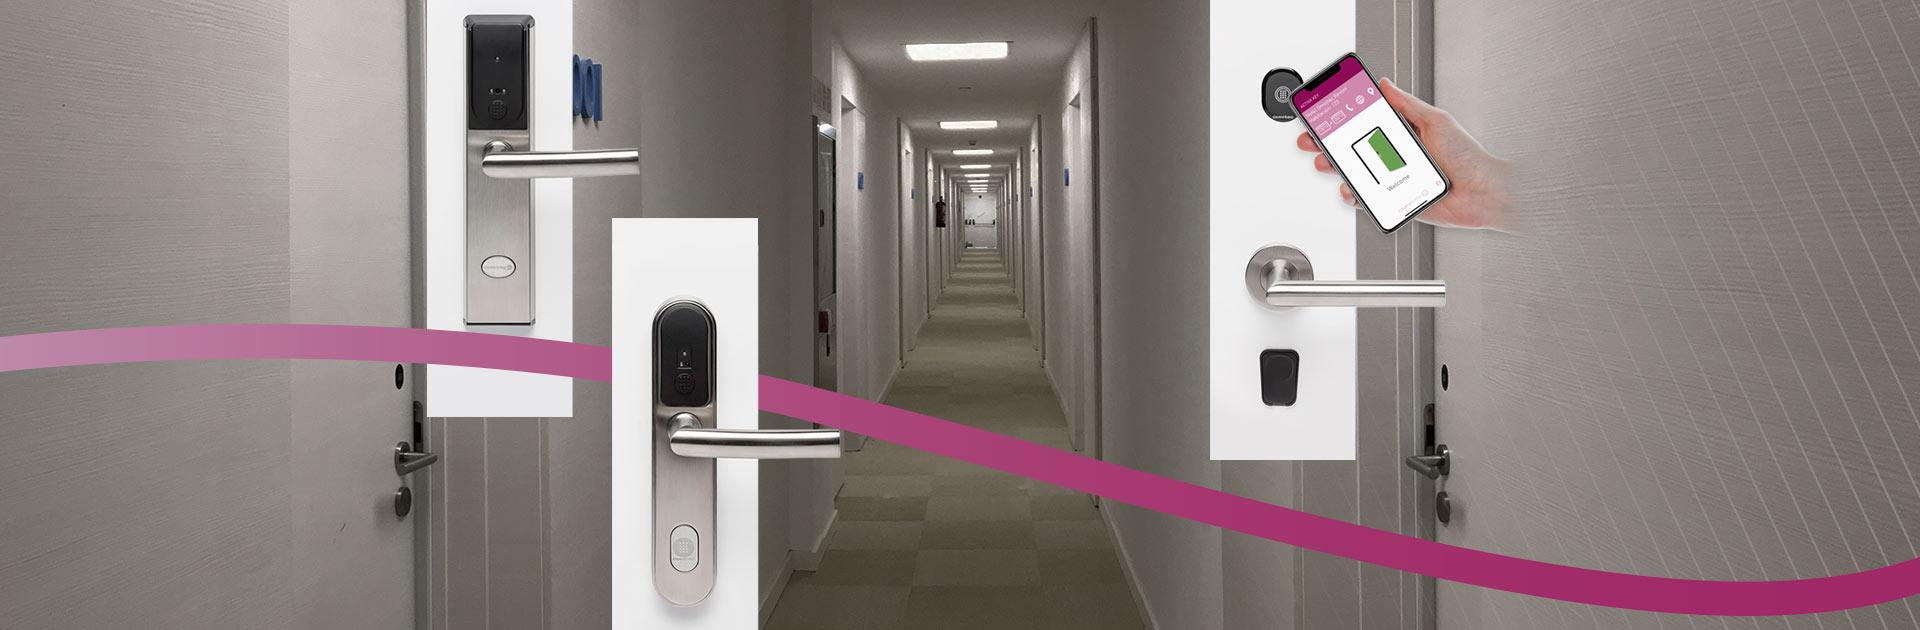 Electronic Lock Access Control Safe And Minibar Omnitec Systems Keys Can Wiring Diagram Locks Hotel Innovation